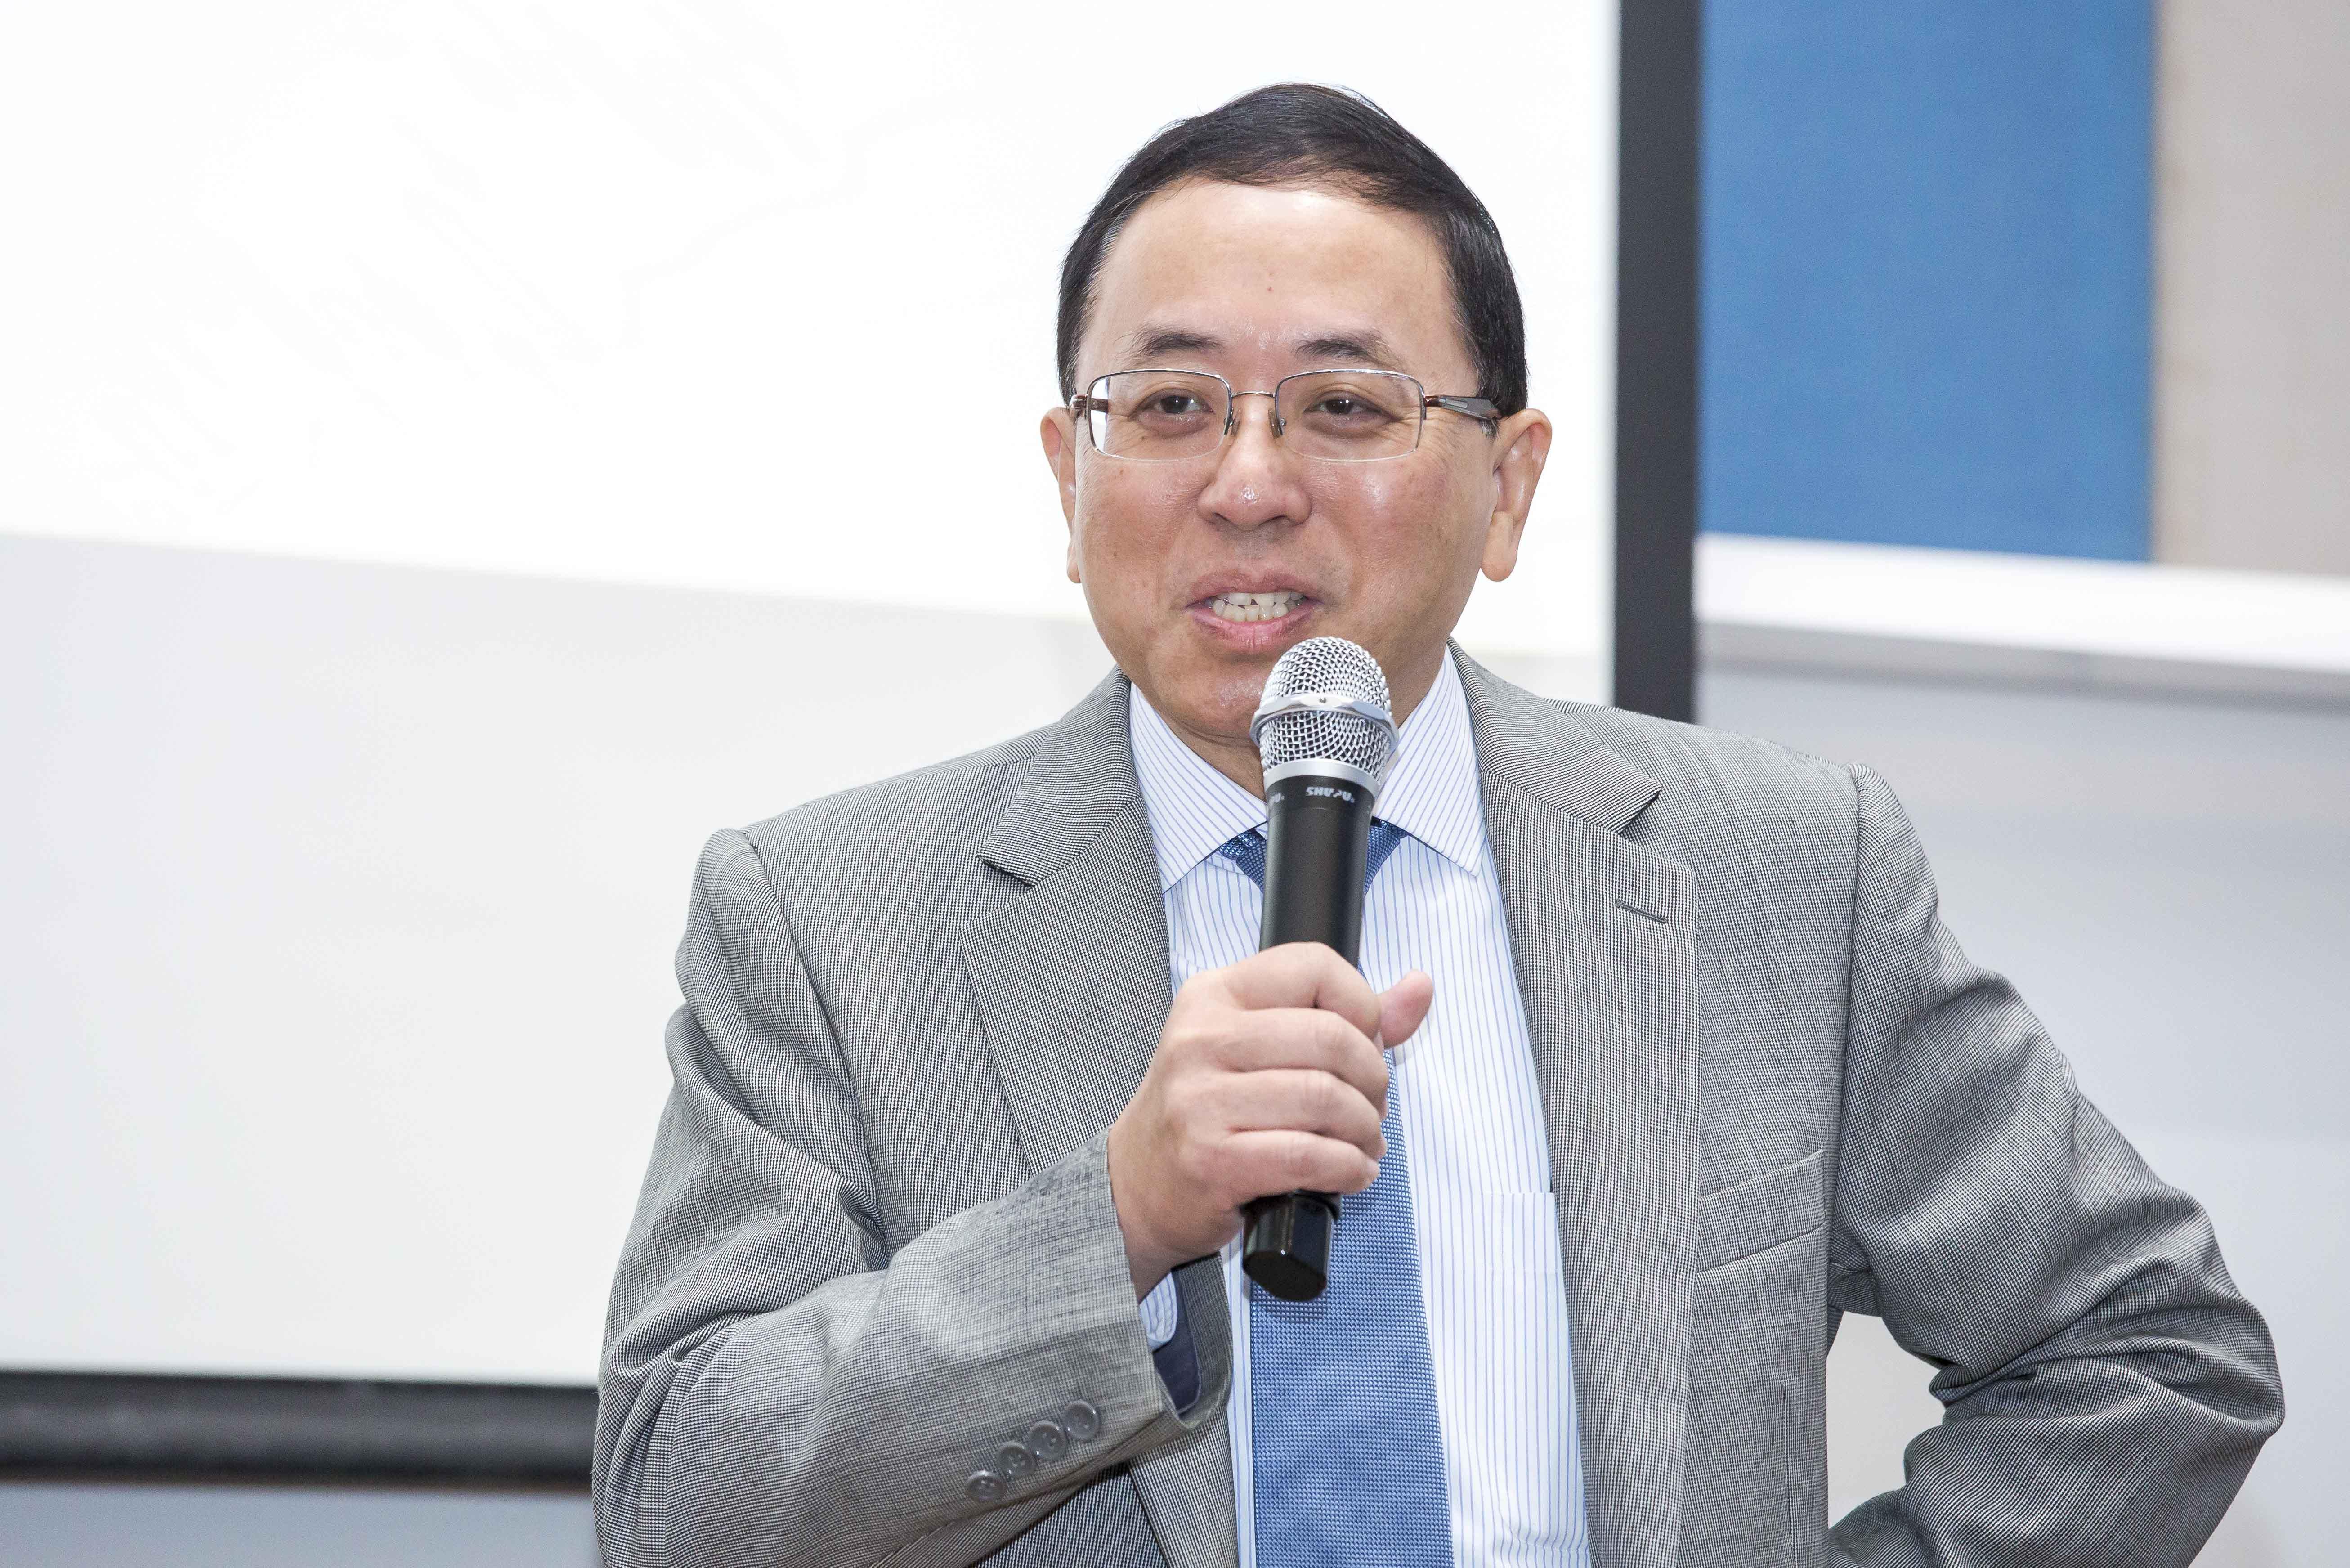 Vice Rector Lionel Ni delivers a speech